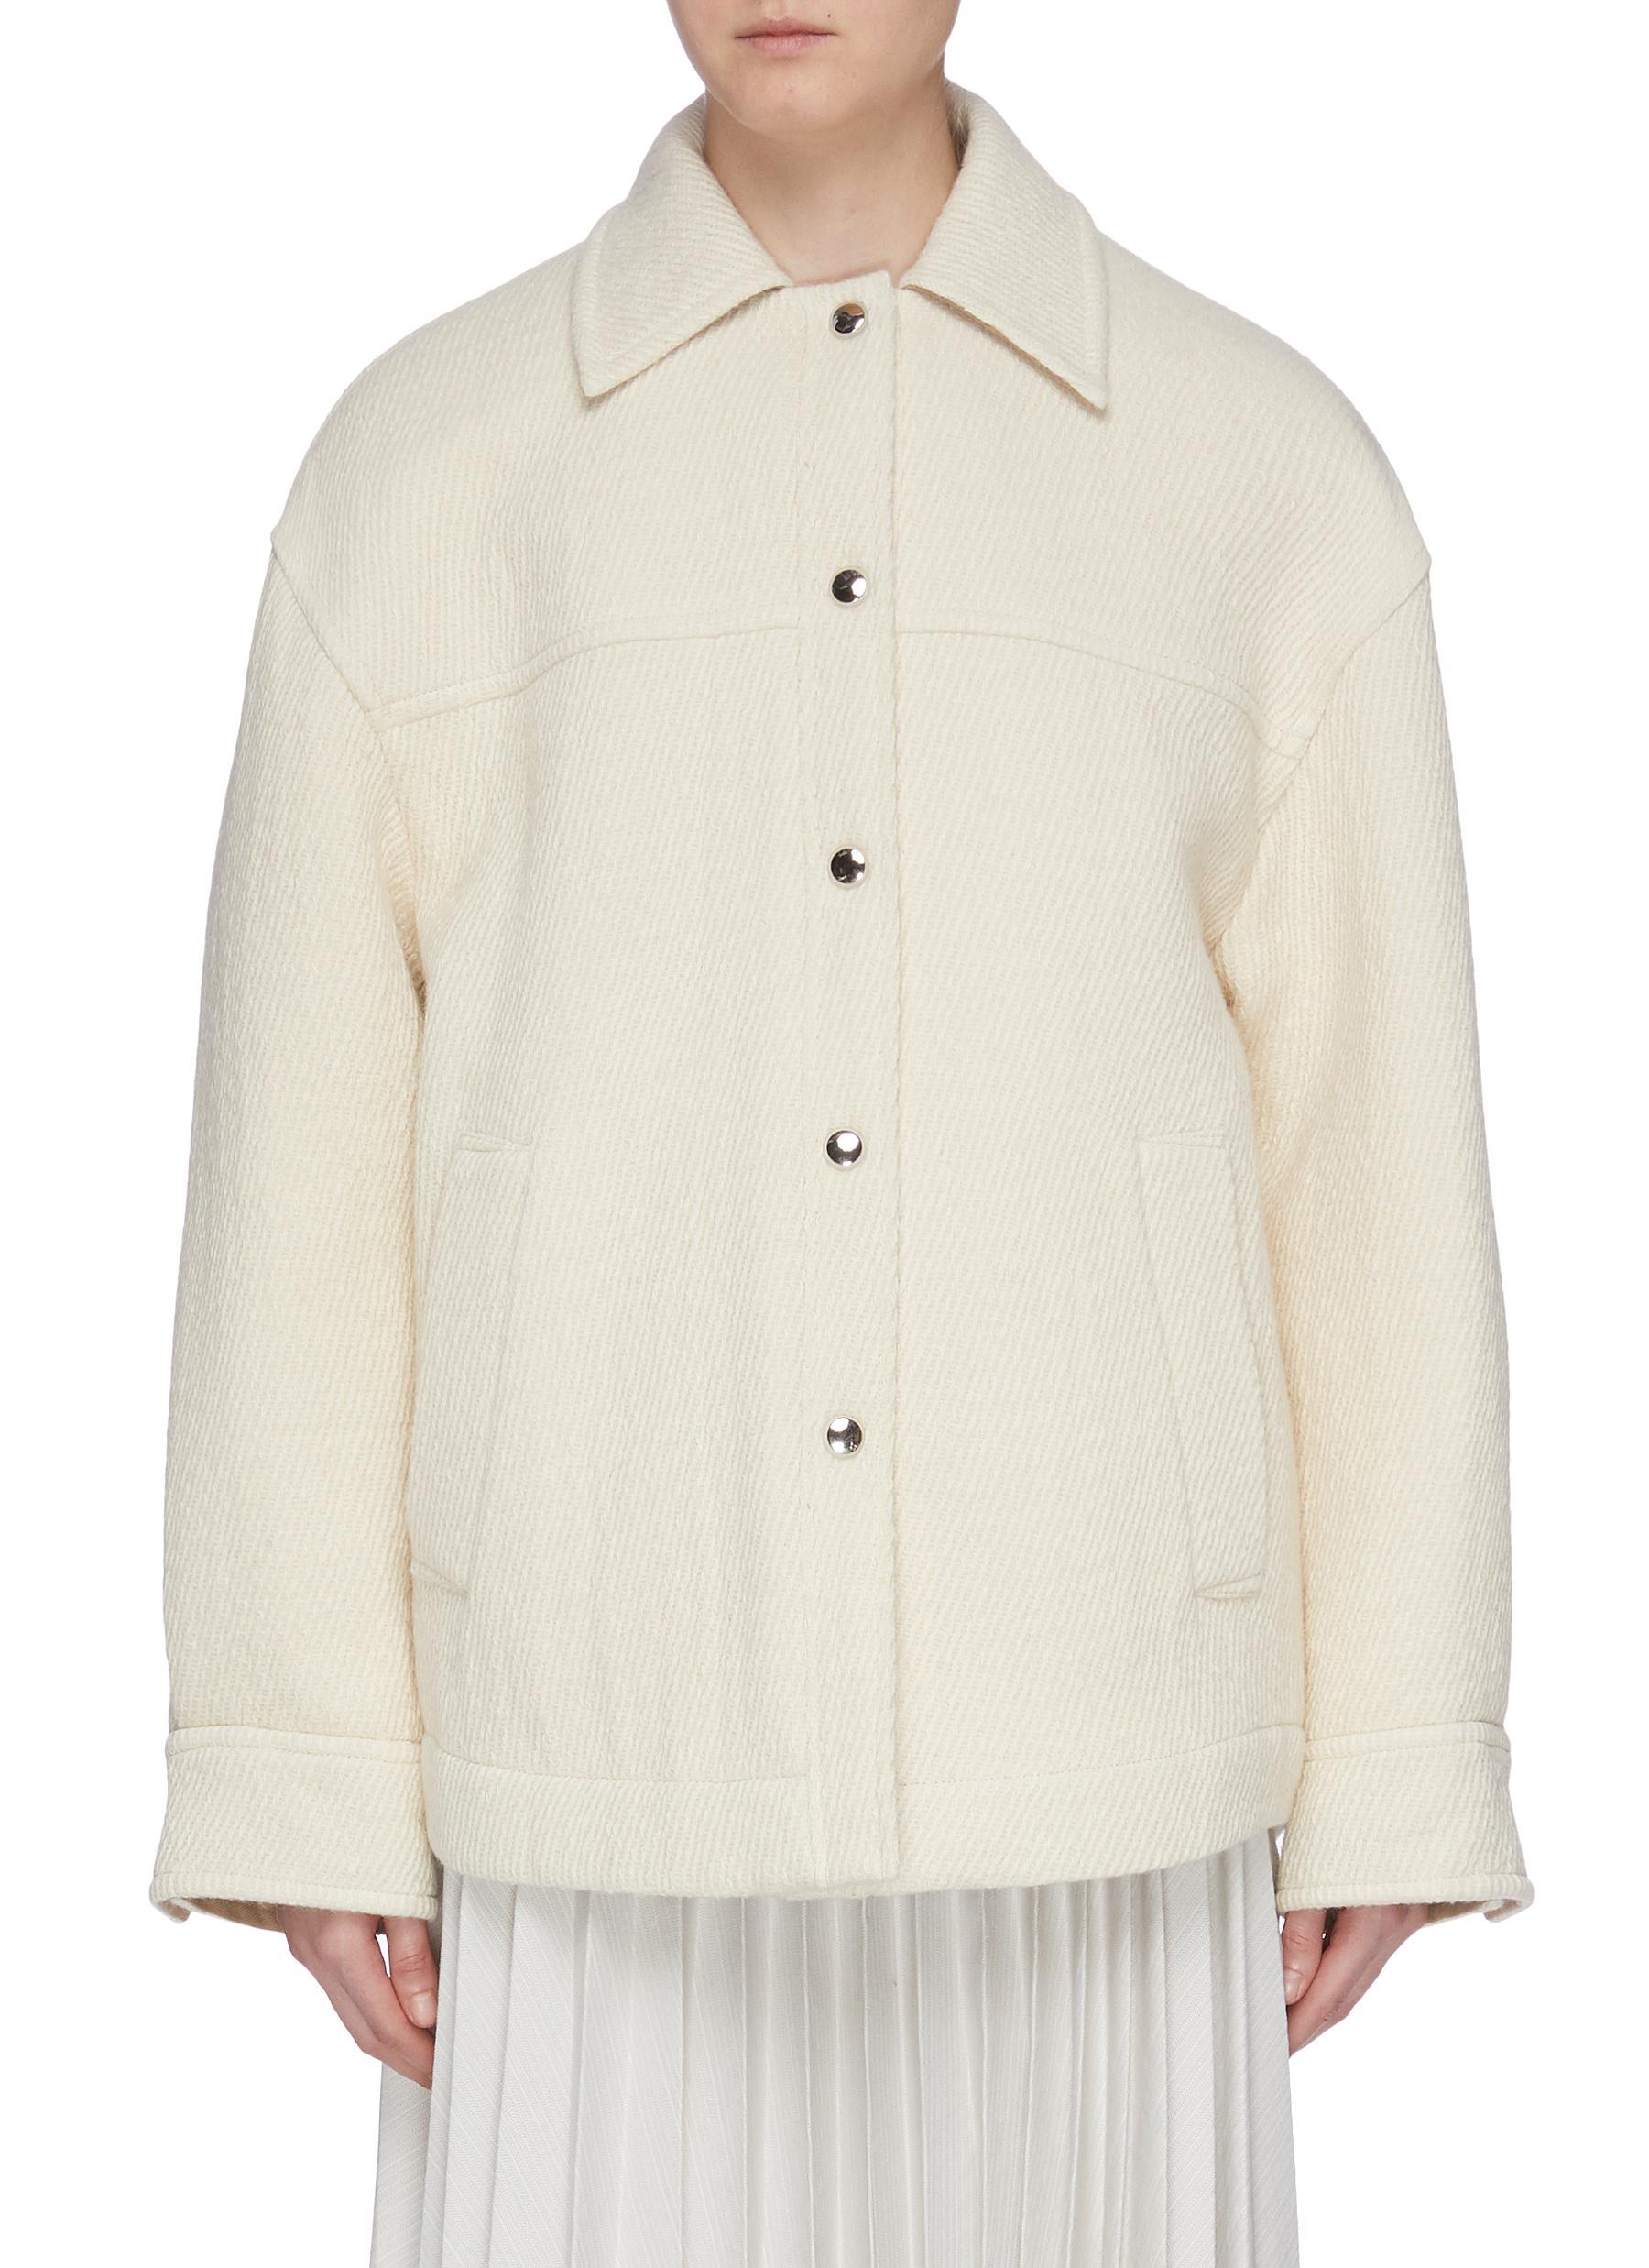 Oversized twill shirt jacket by Acne Studios